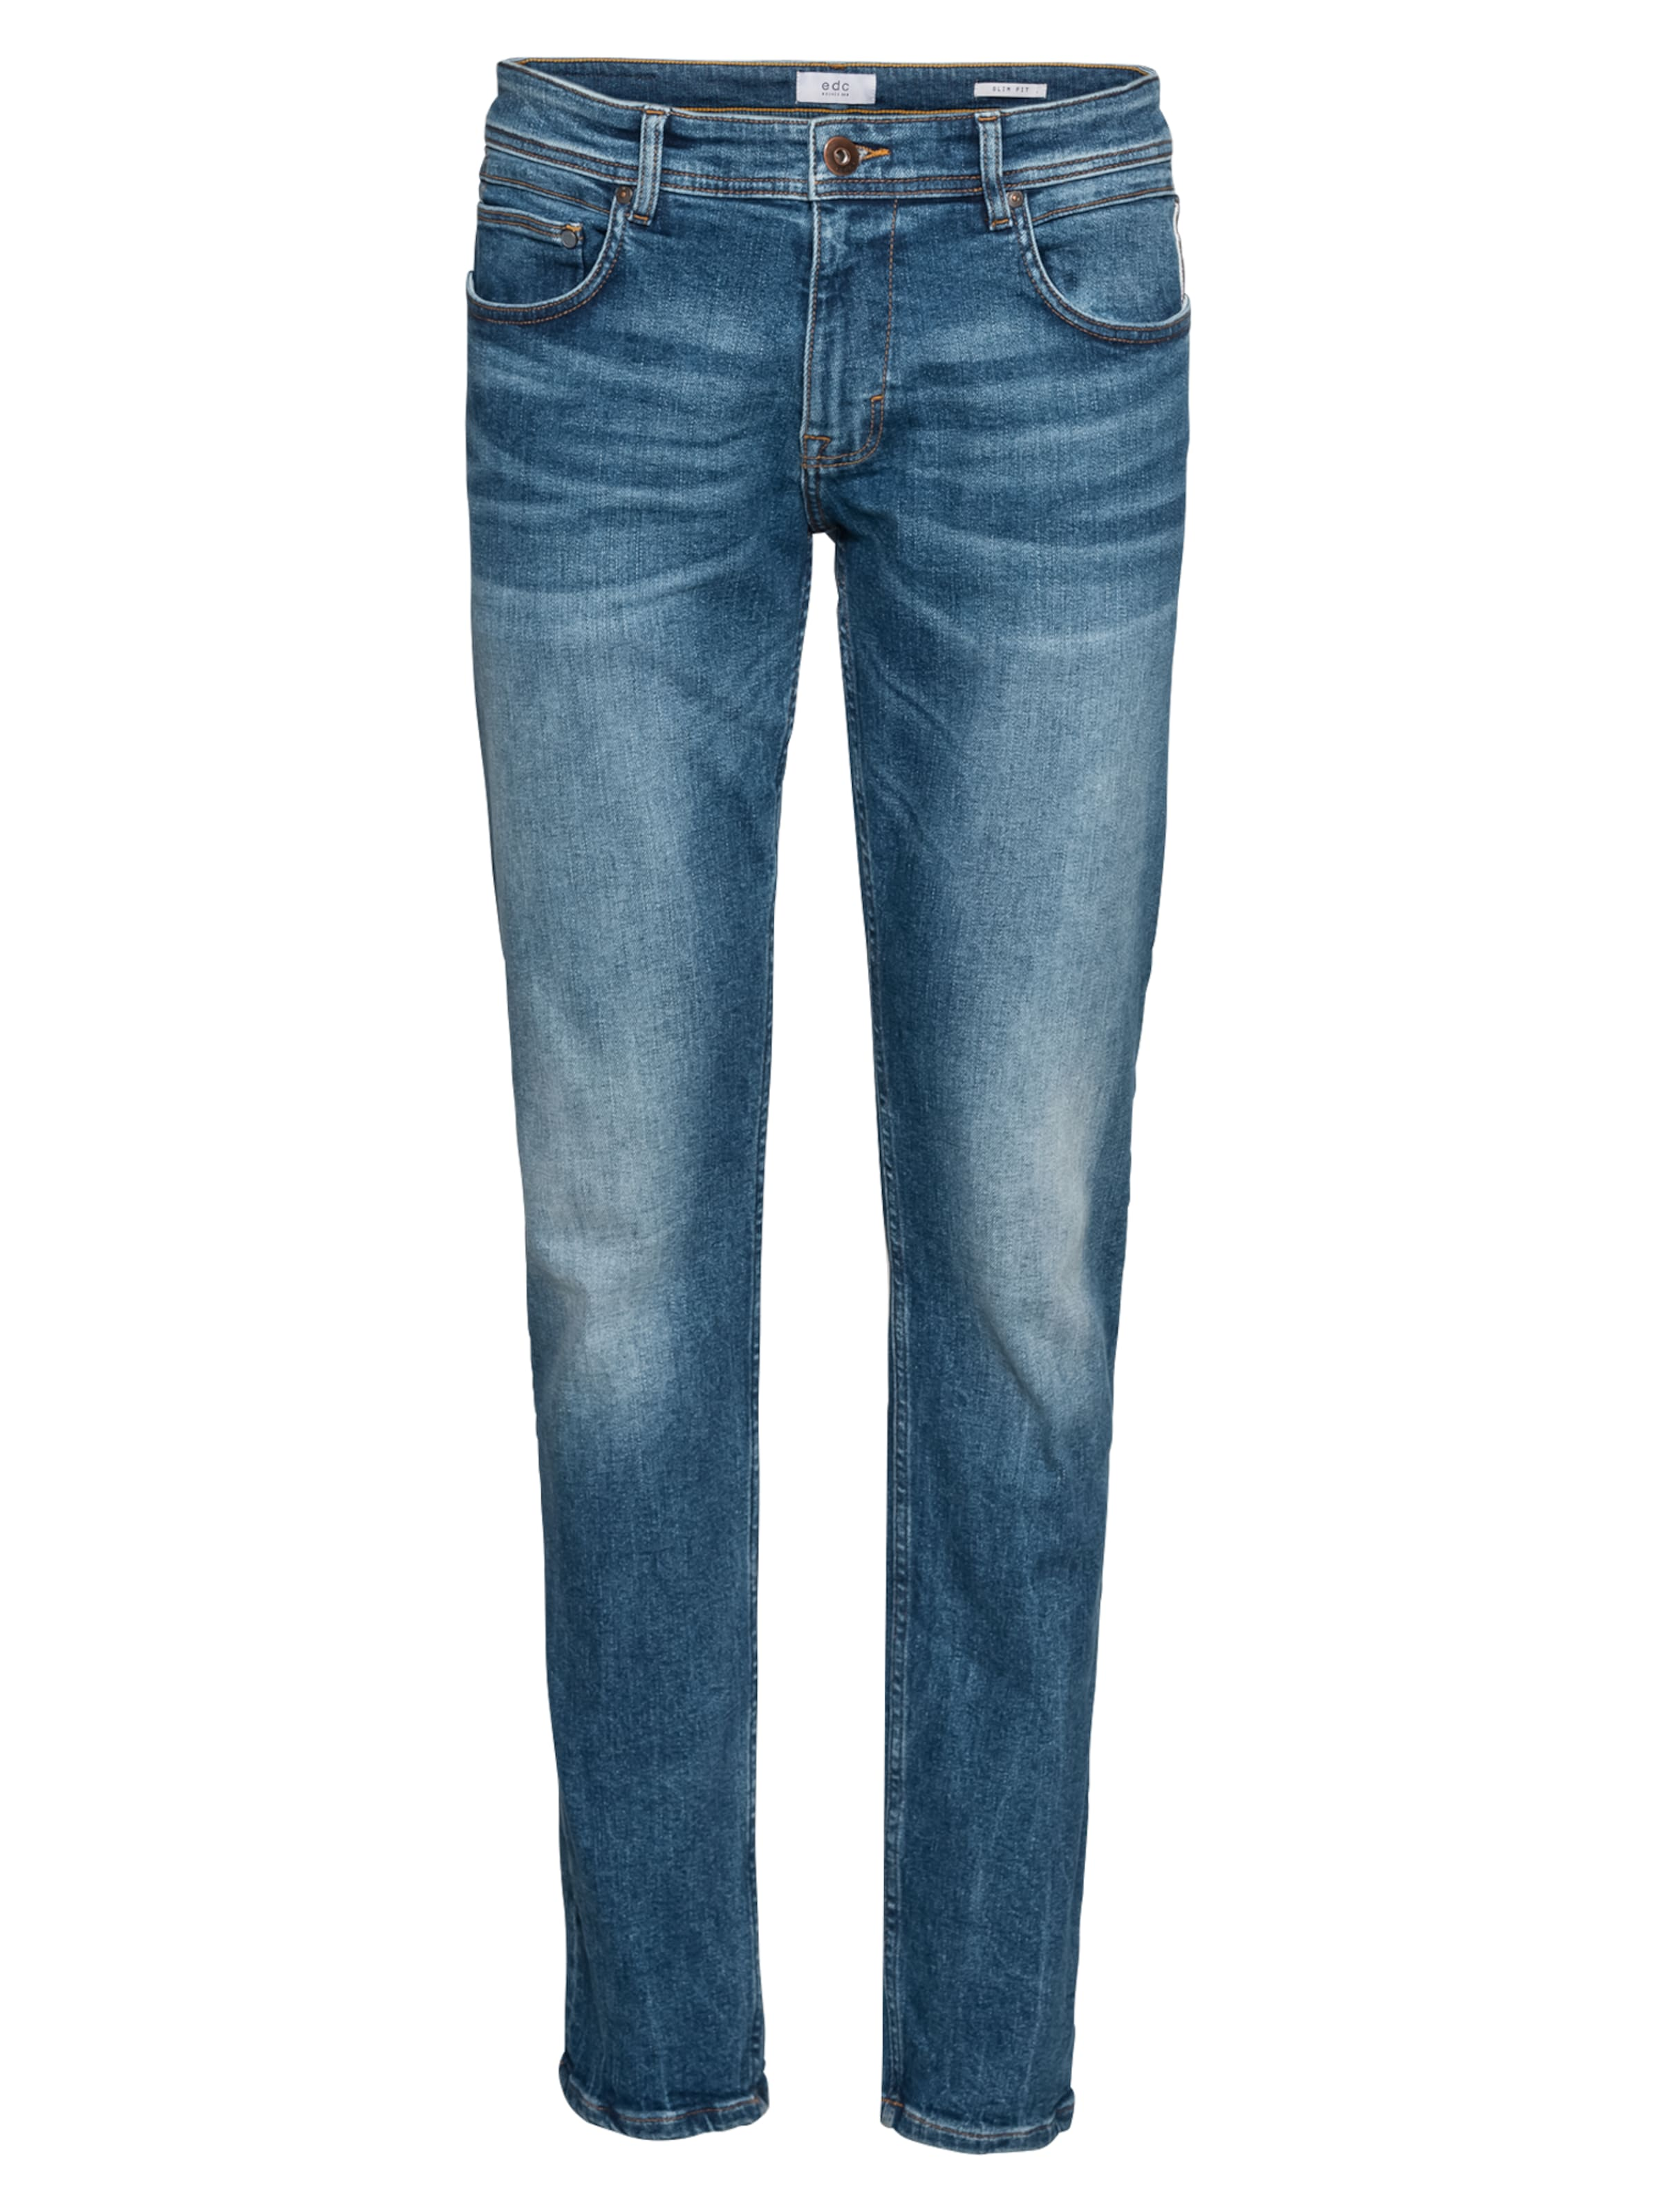 'ocs Jean Bleu Denim Pkt En Slim Esprit Pants 5 Denim' By Edc 80nwNvm